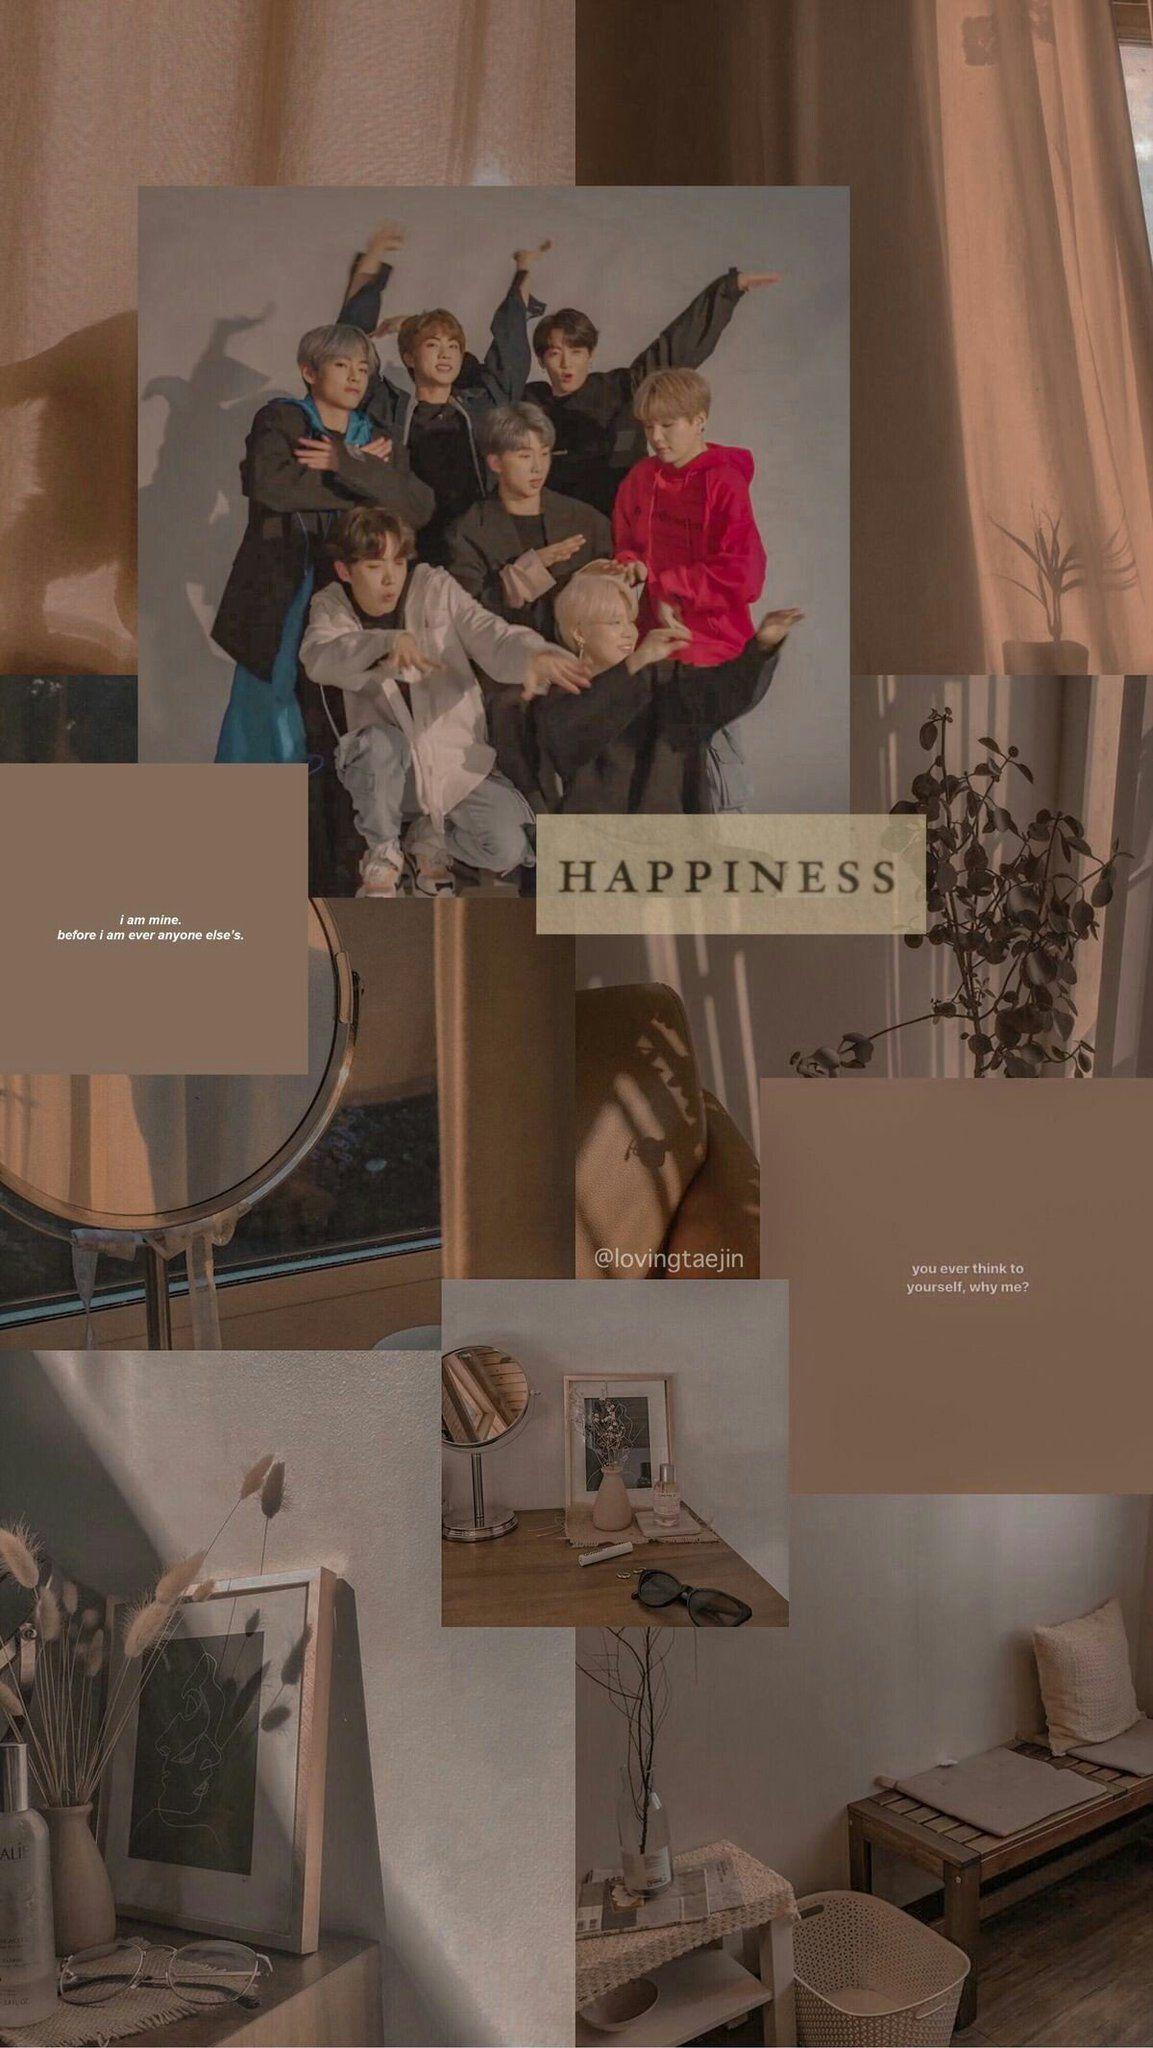 Peachy على In 2020 Inspirational Phone Wallpaper Bts Aesthetic Wallpaper For Phone Wallpaper Iphone Love